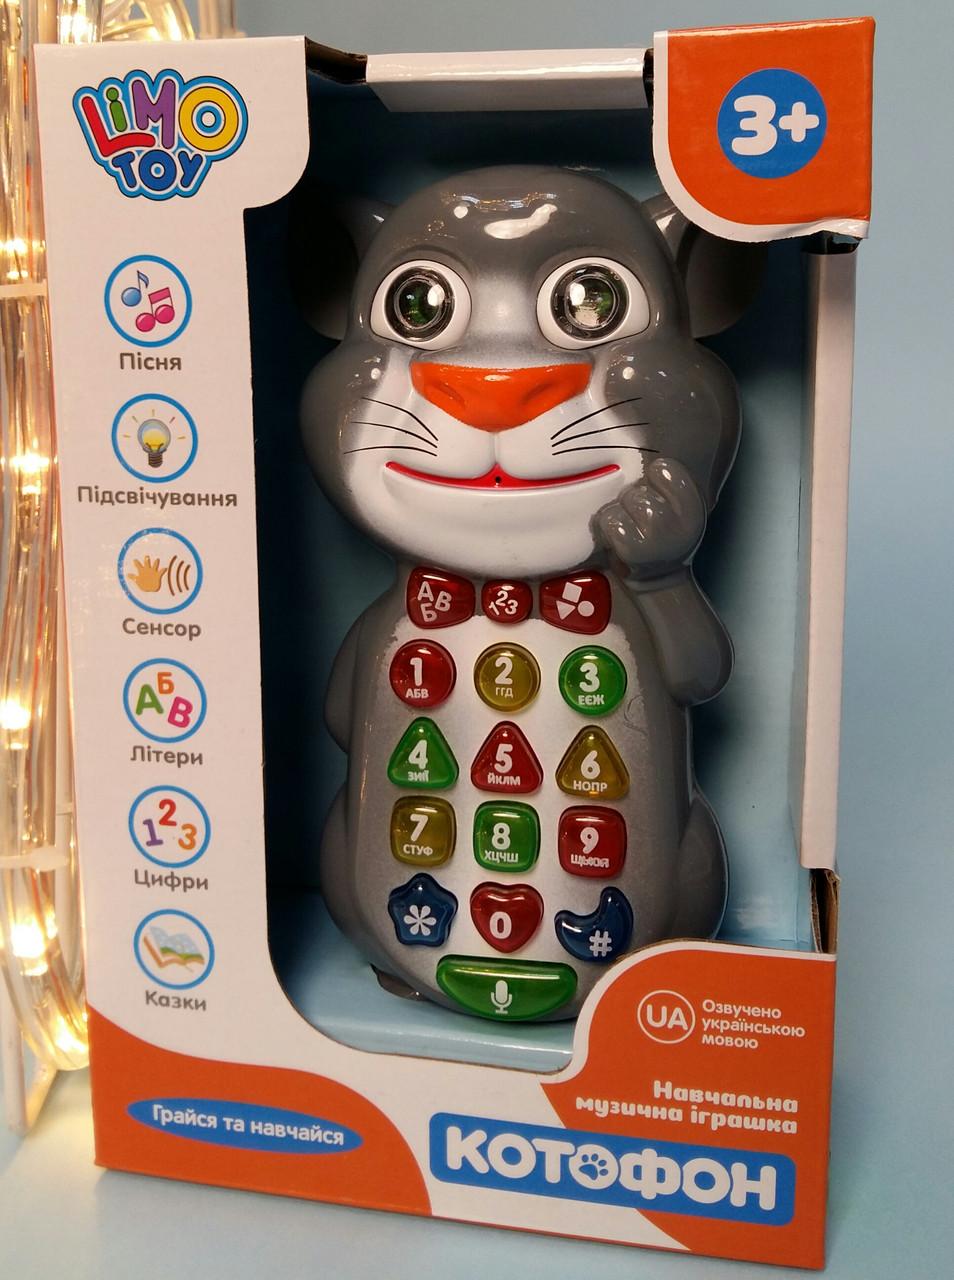 Розумний телефон Котофон Limo Toy 7344 UI 20*12*6см